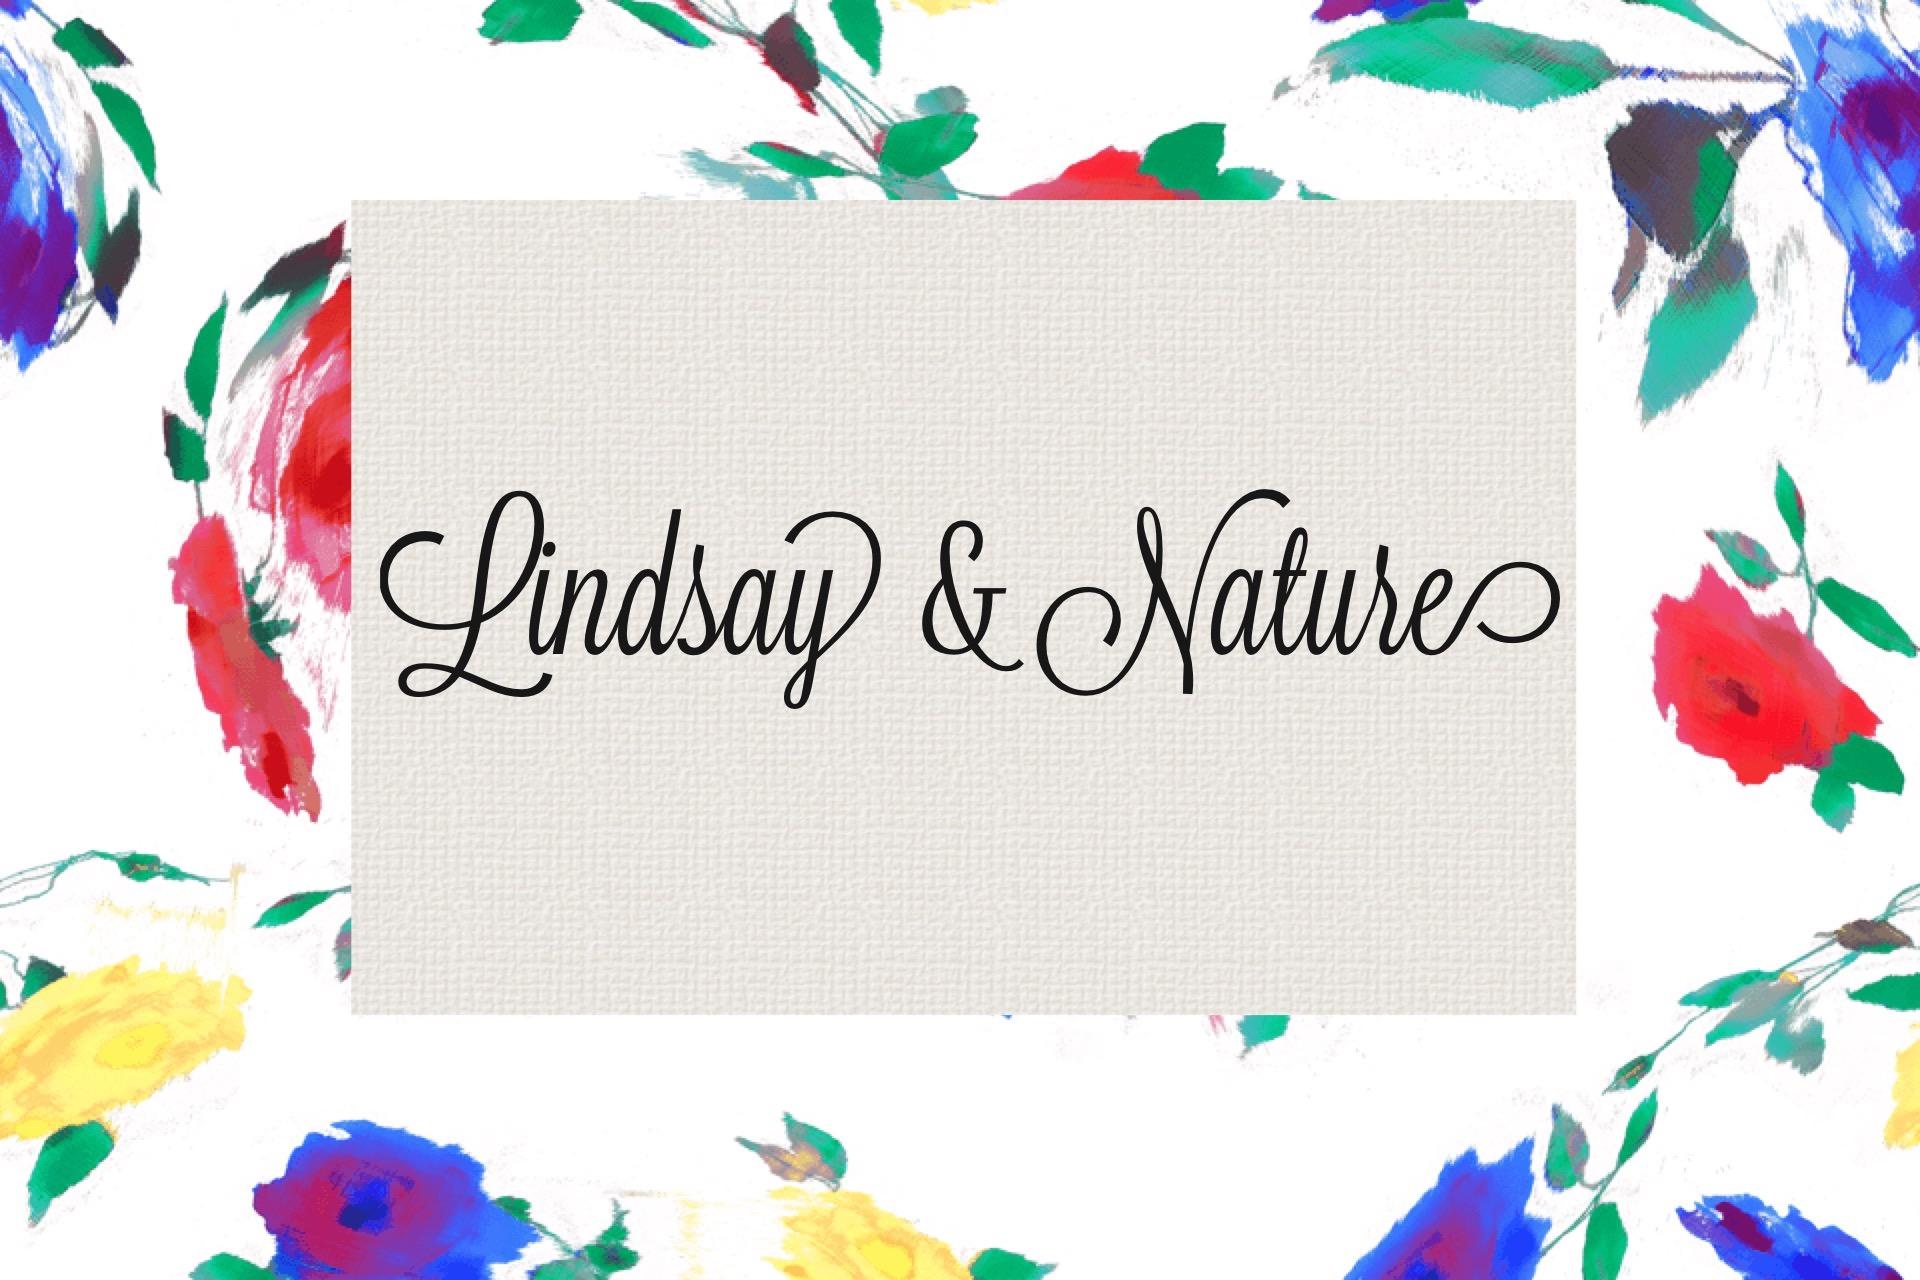 Lindsay & Nature